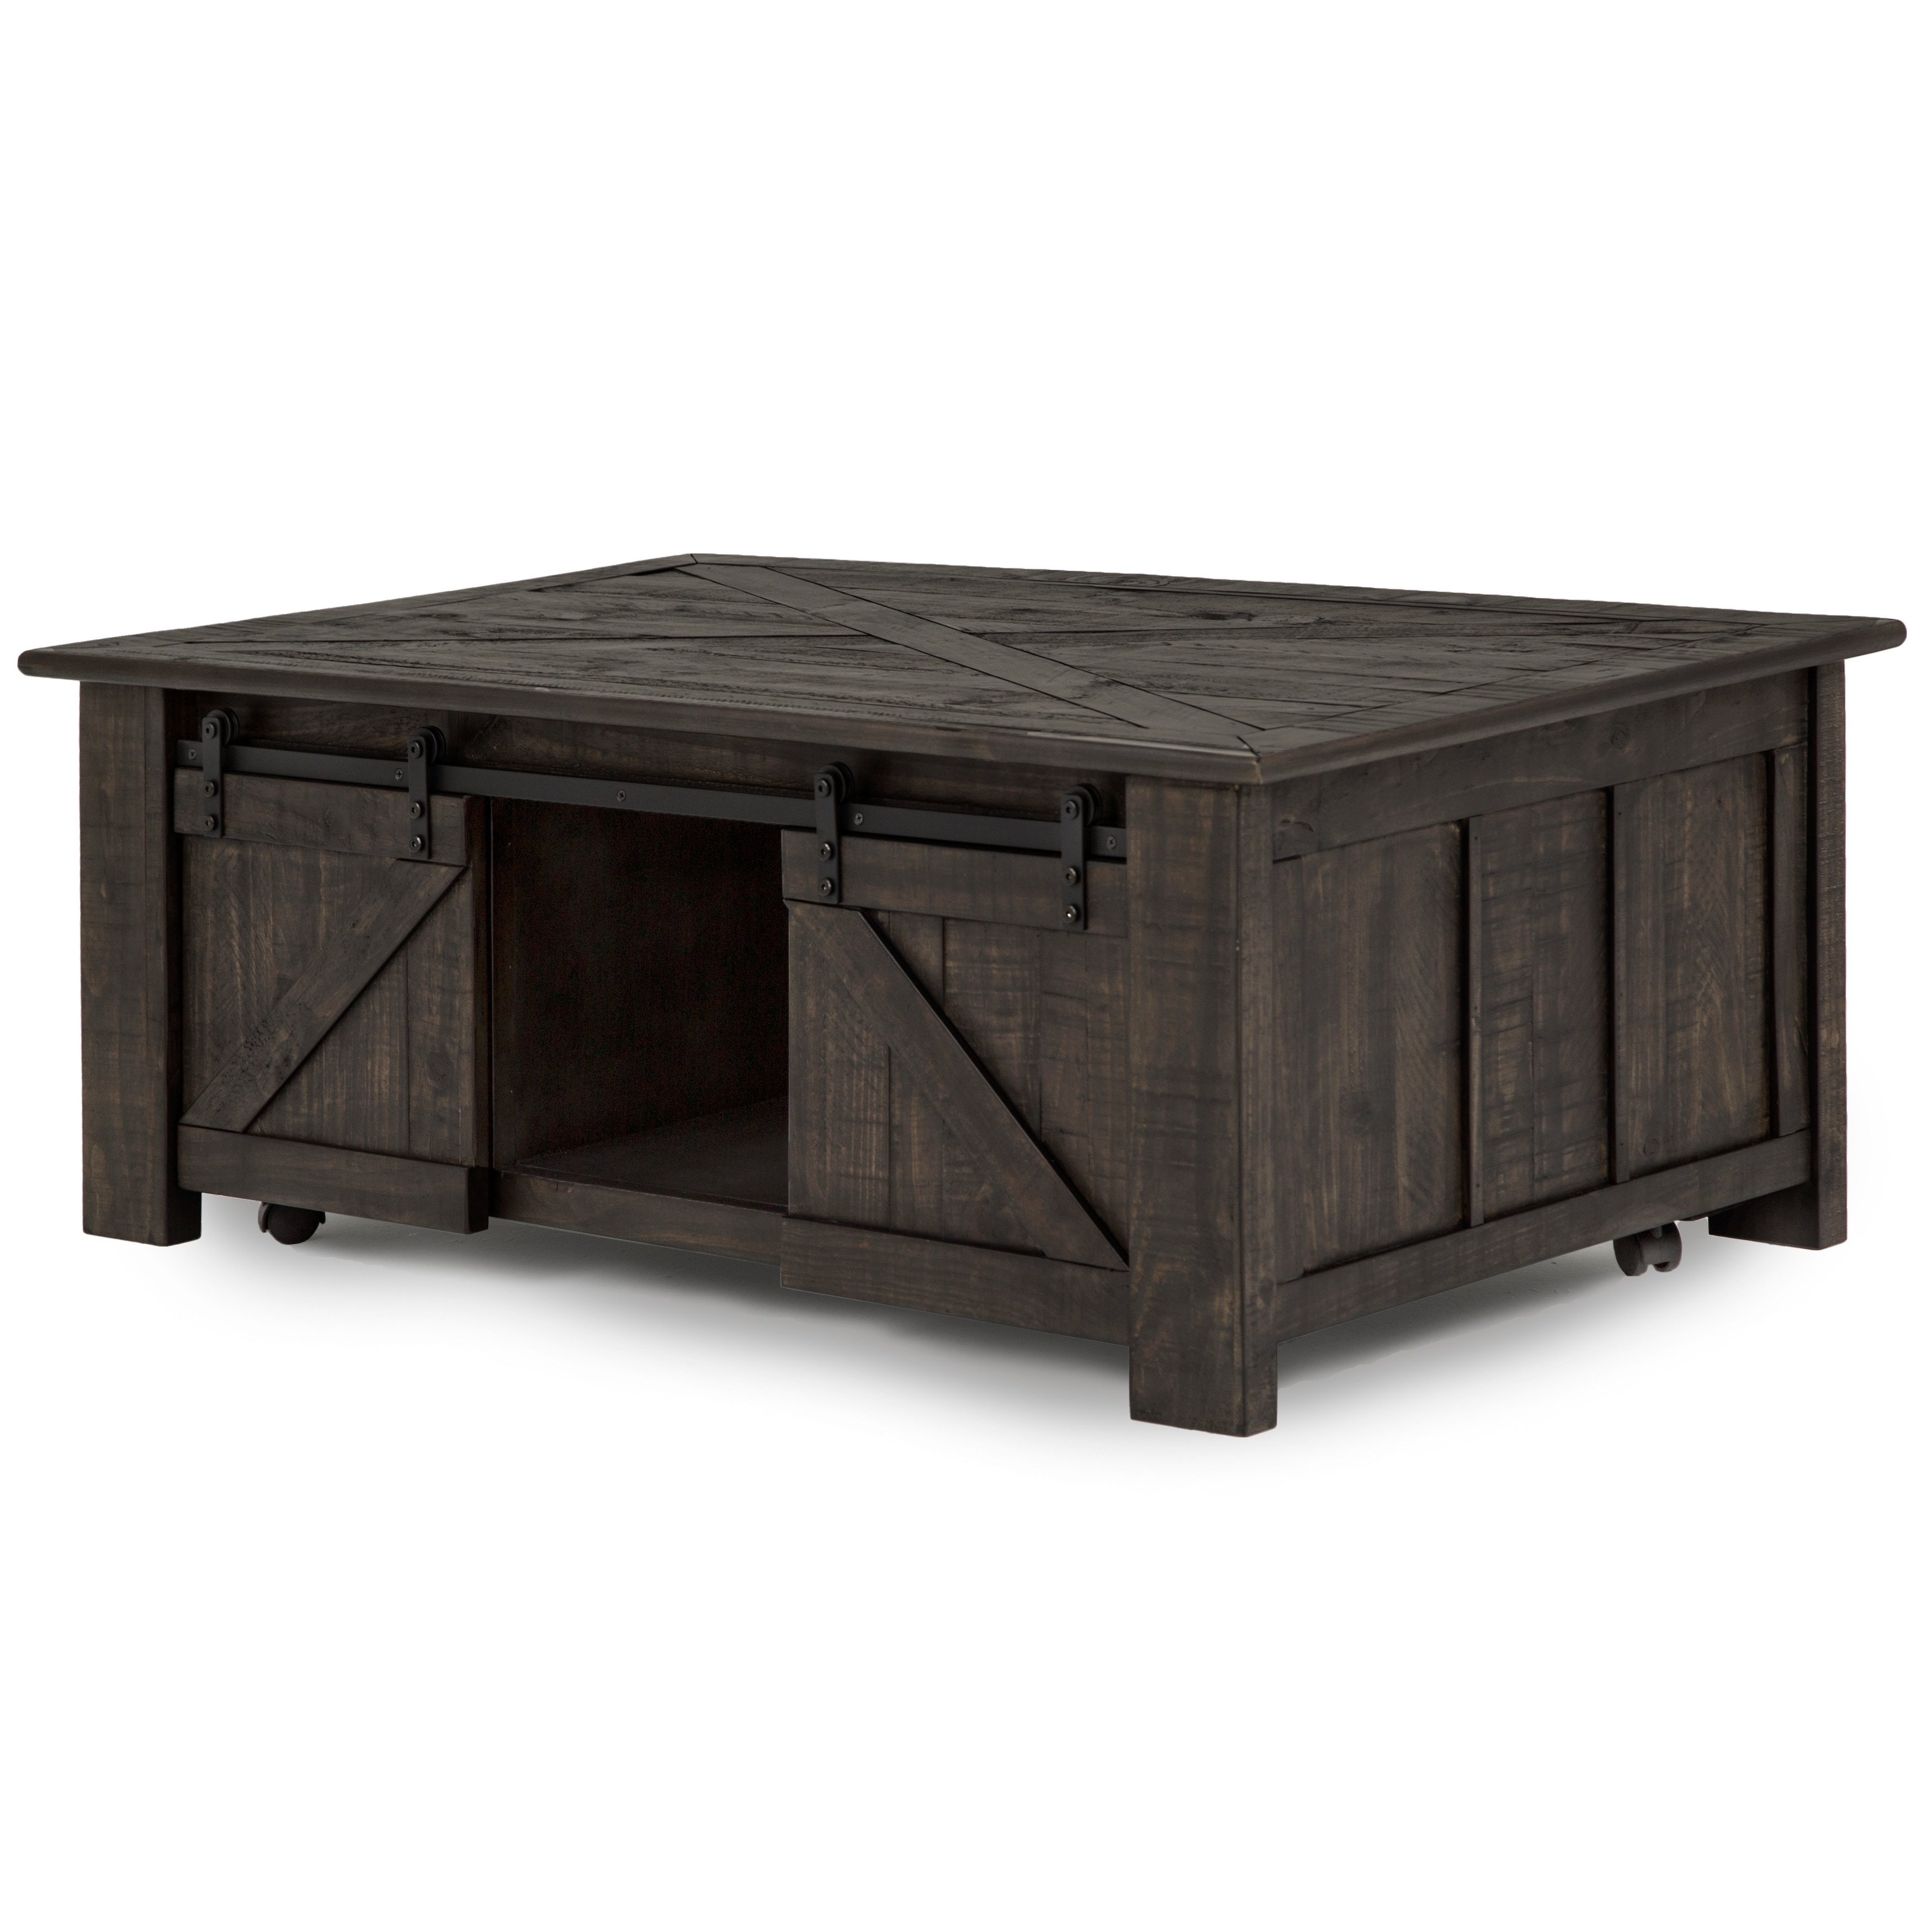 Garrett Rustic Weathered Charcoal Lift Top Sliding Door Coffee Table With Casters Overstock 13321503